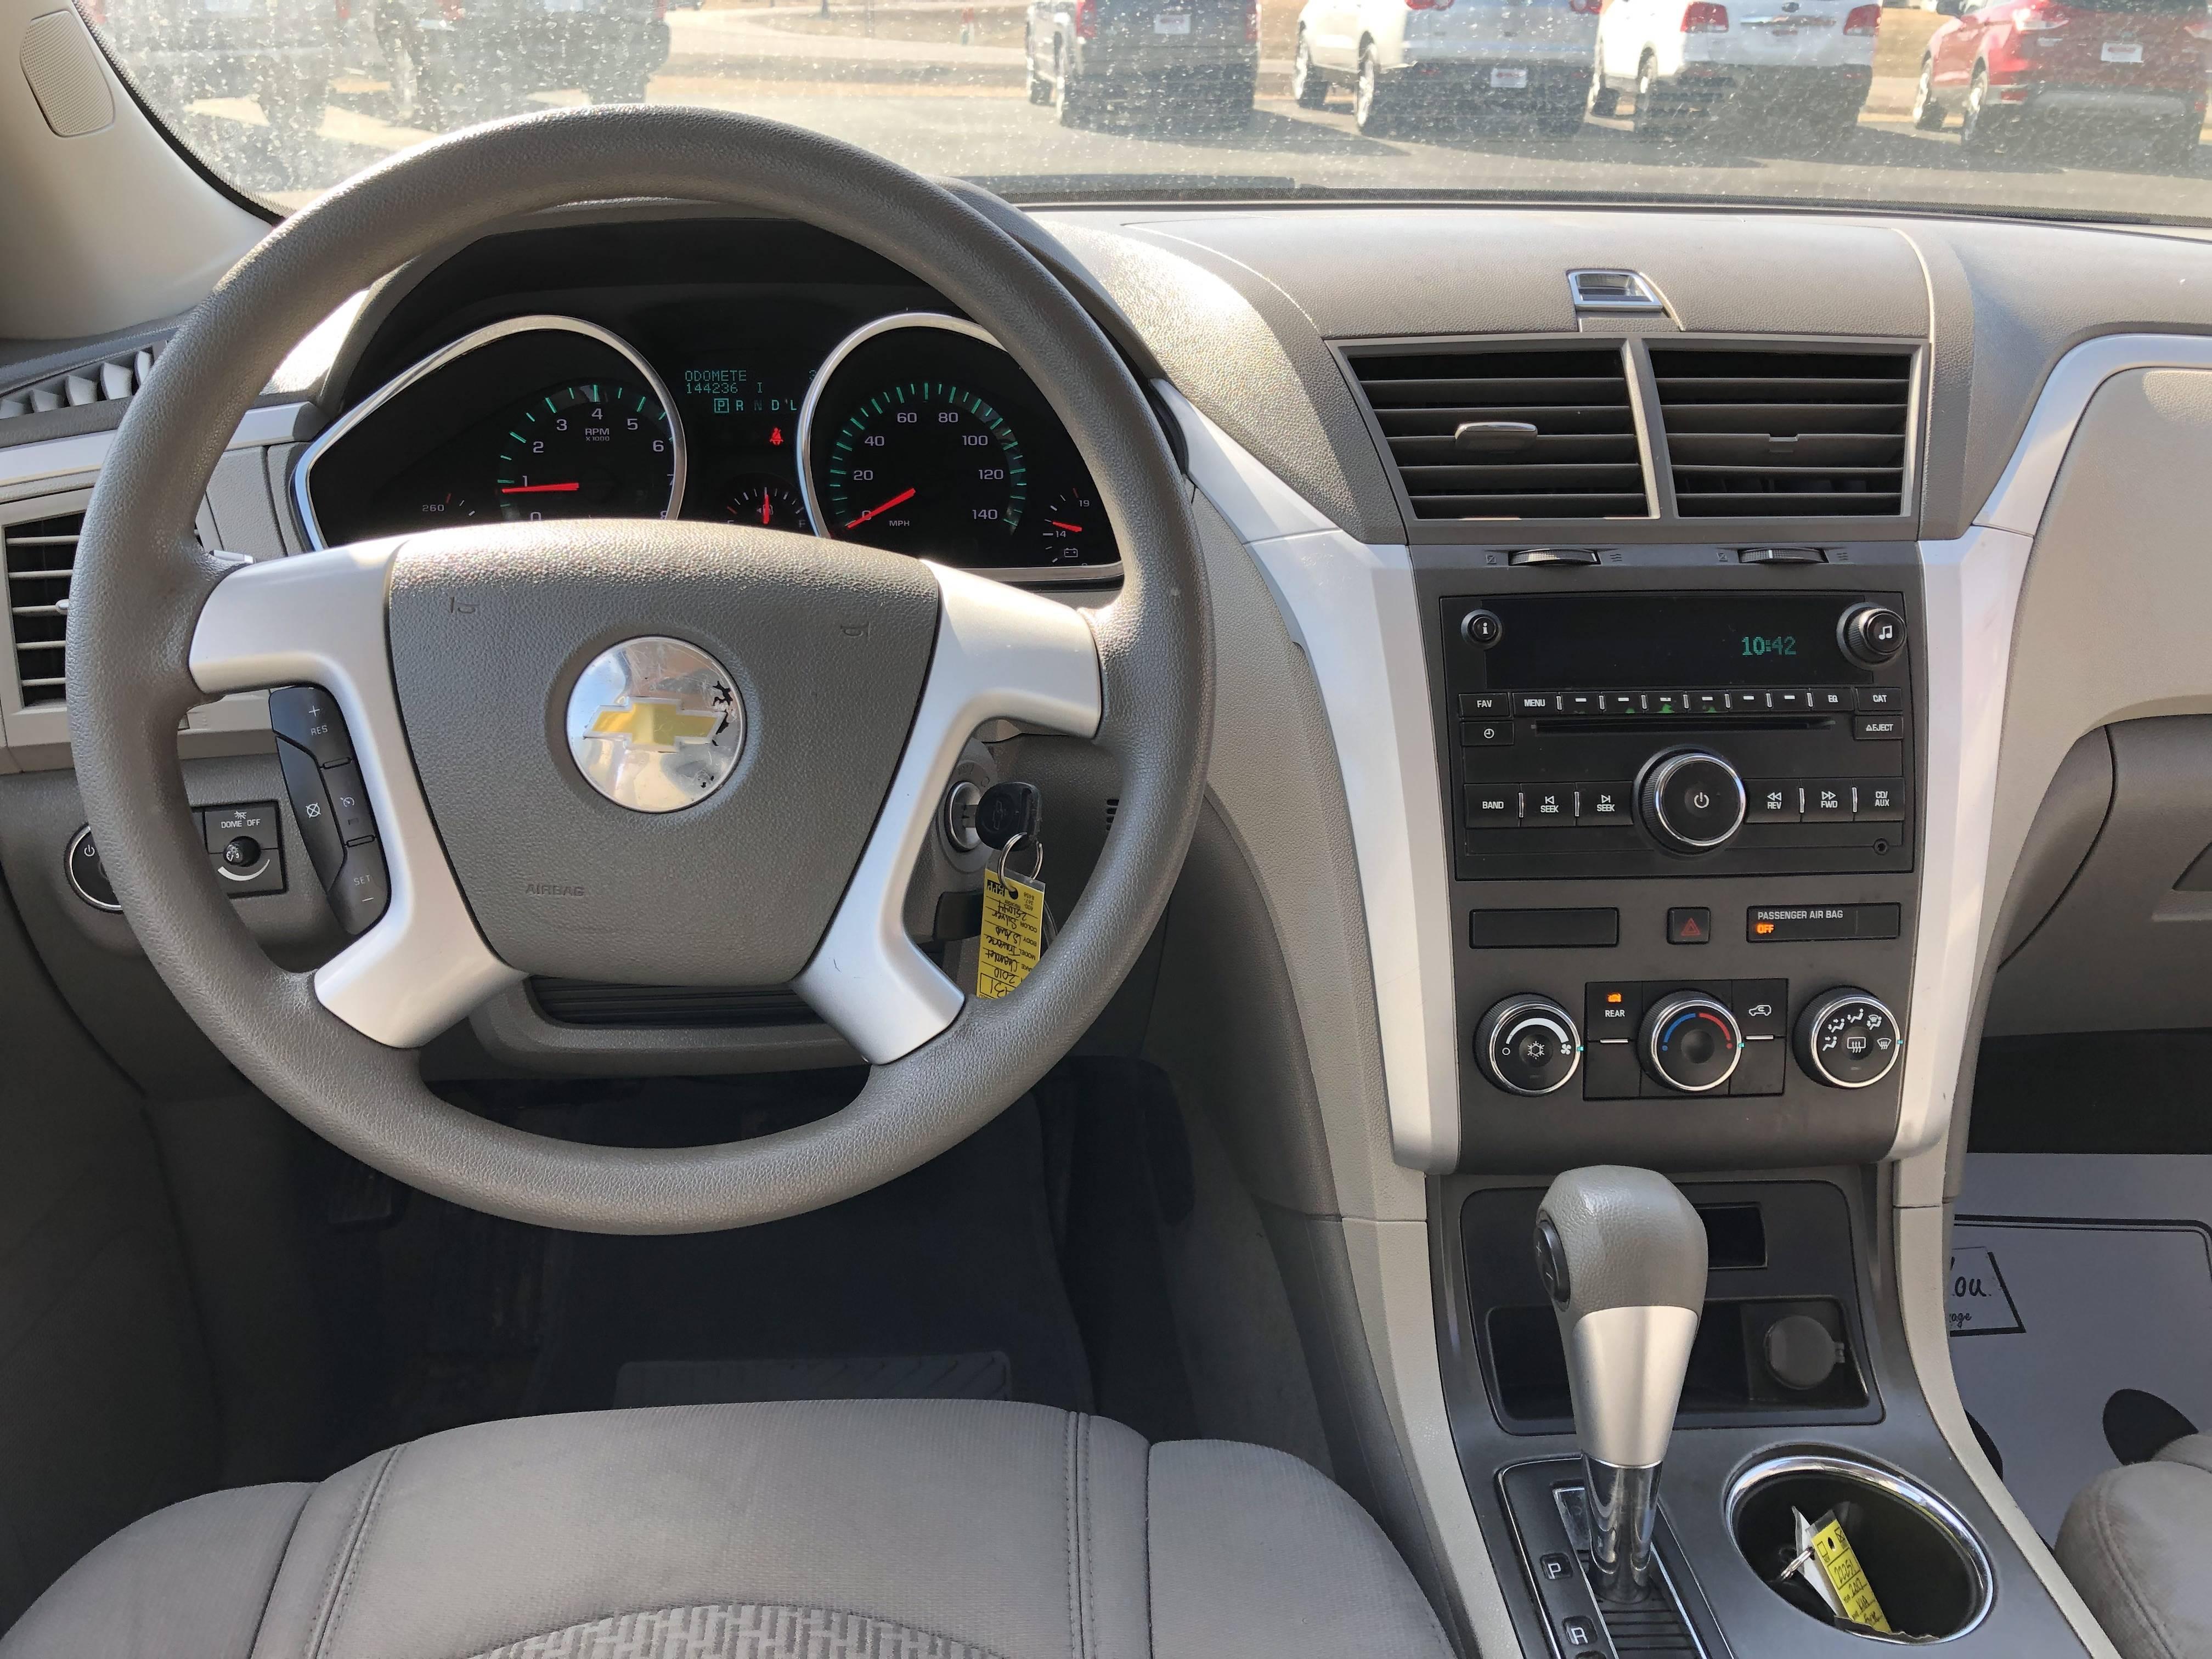 used vehicle - SUV Chevrolet Traverse 2010